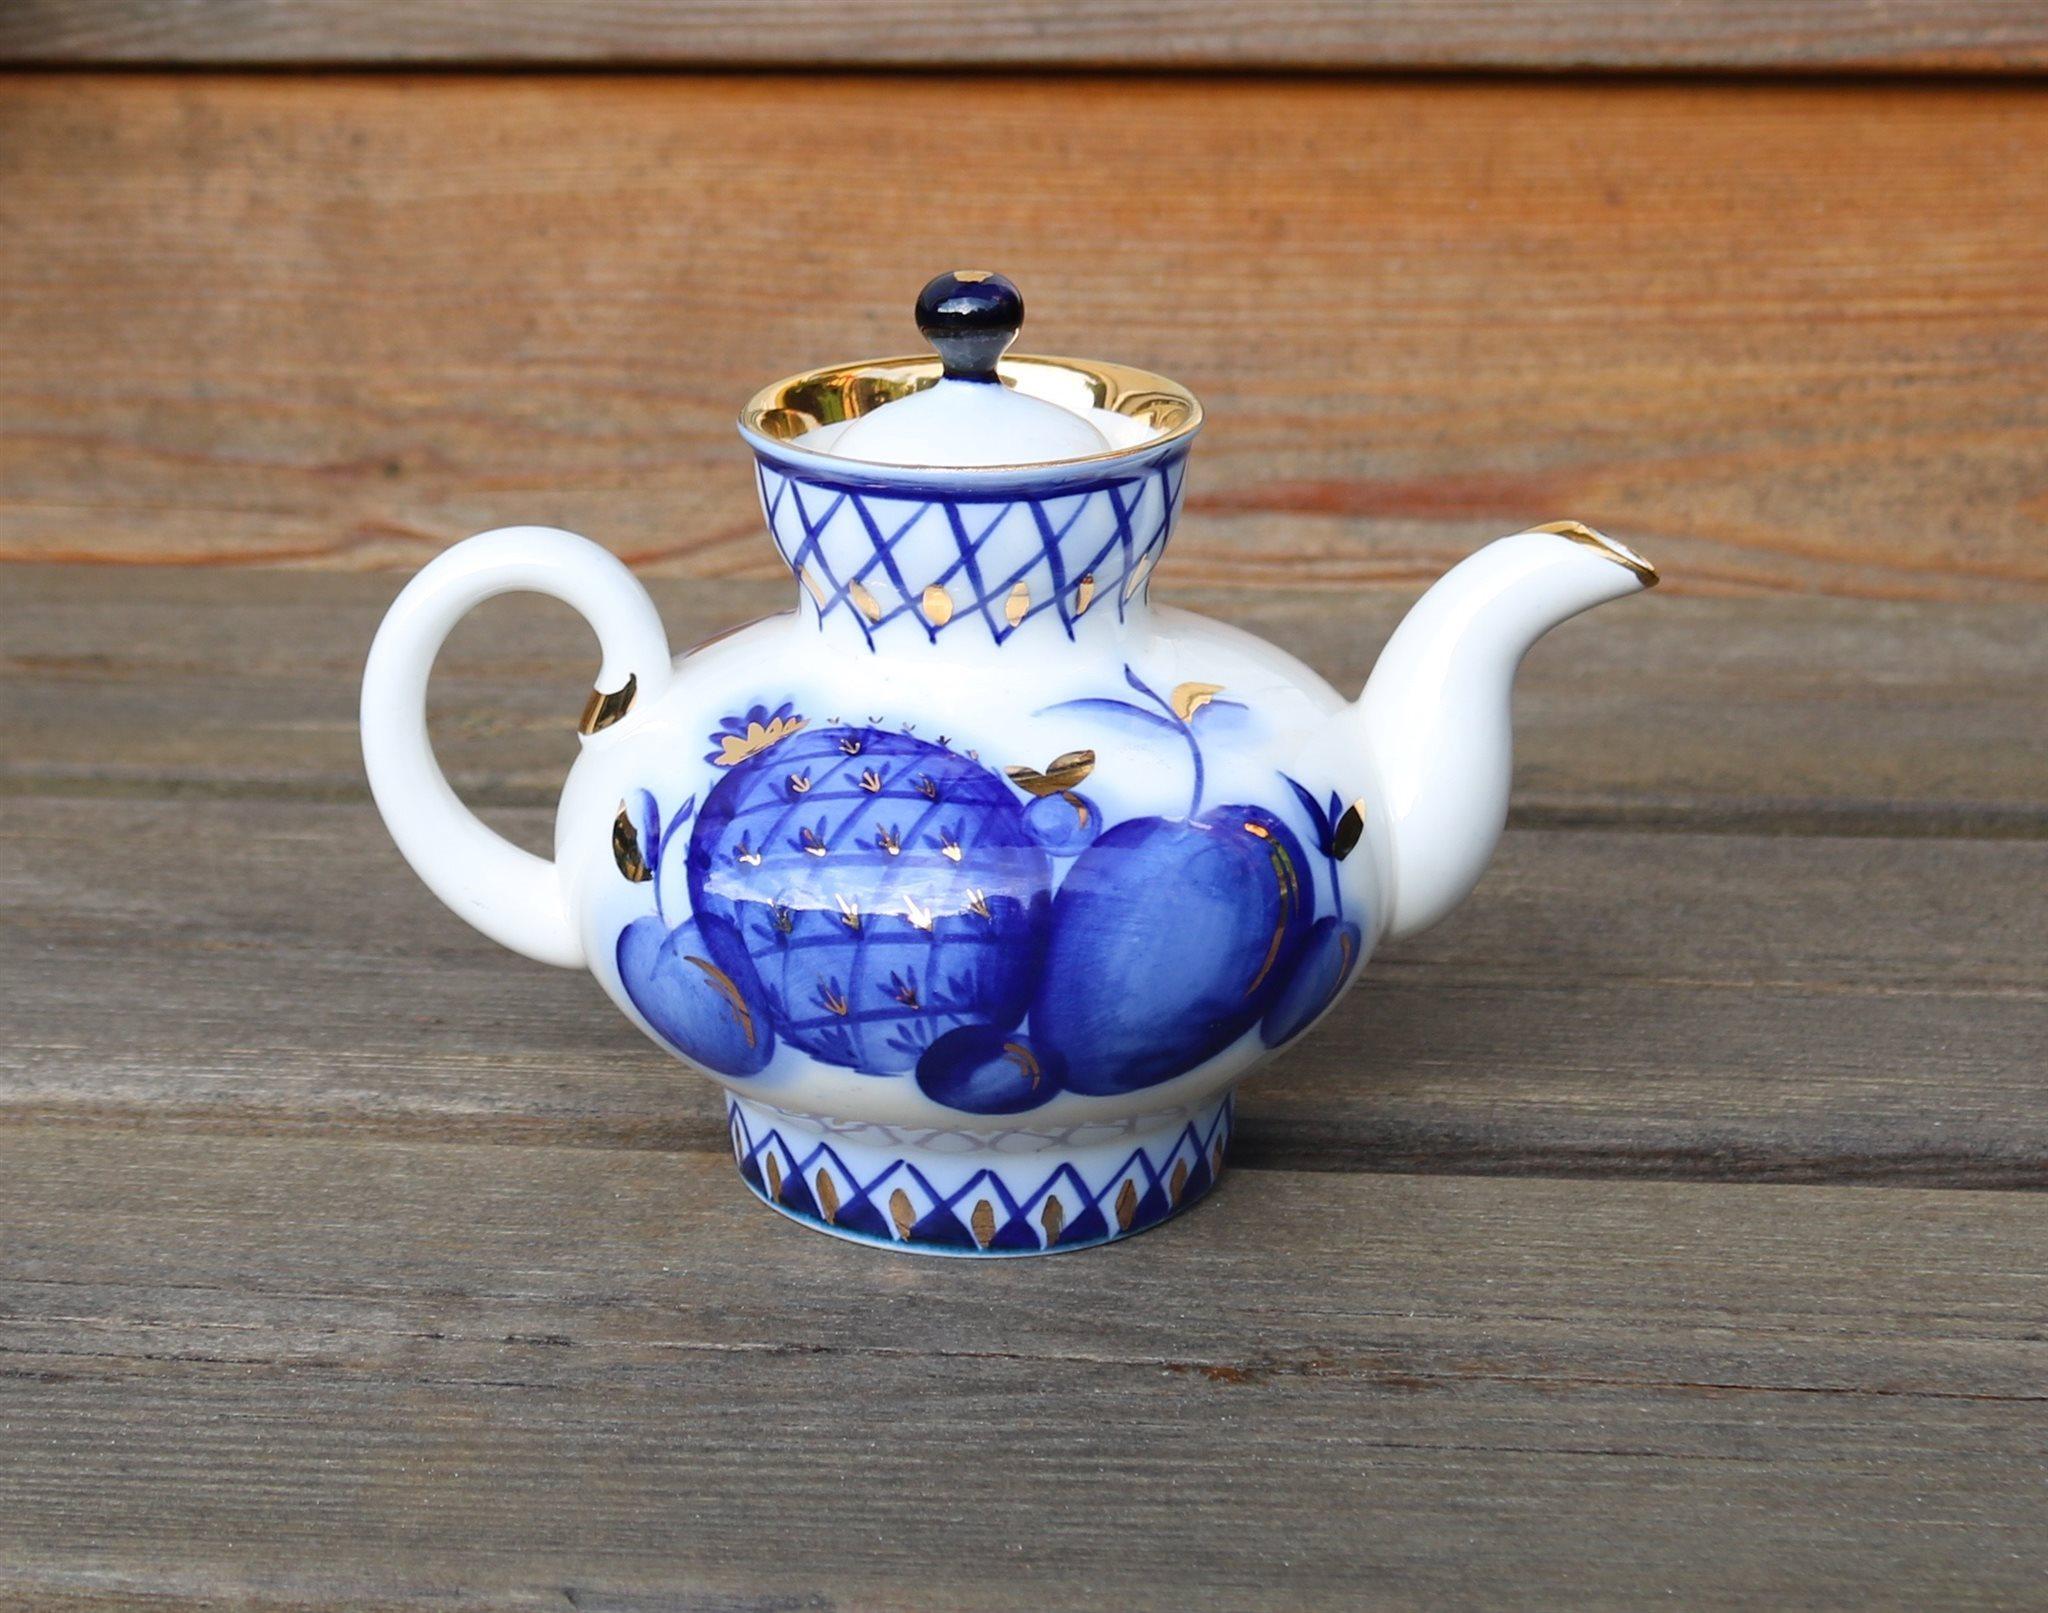 affordable unik liten vintage tekanna frn lomonosov ussr agb k guld dekor oanvnd with unik dekor